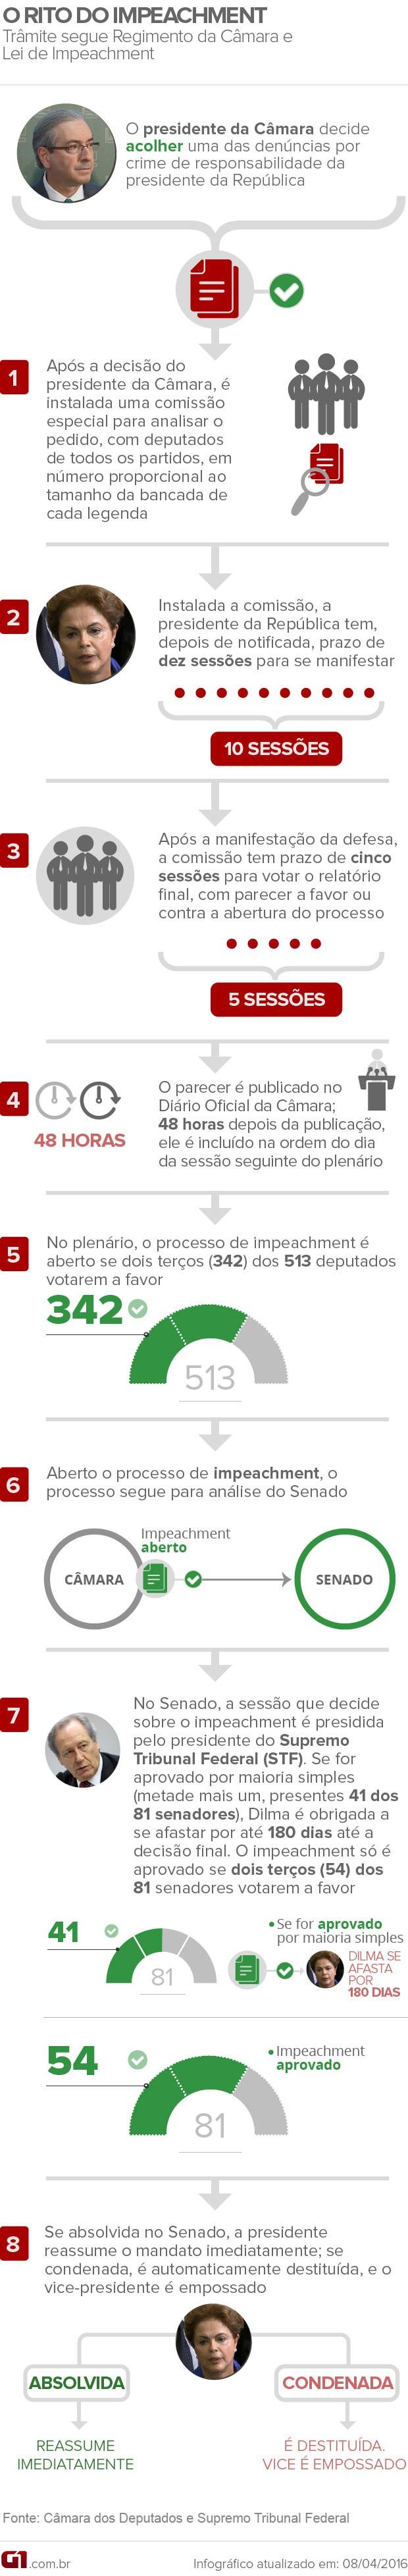 Arte do processo de impeachment da presidente Dilma Rousseff (Foto: Editoria de Arte / G1)